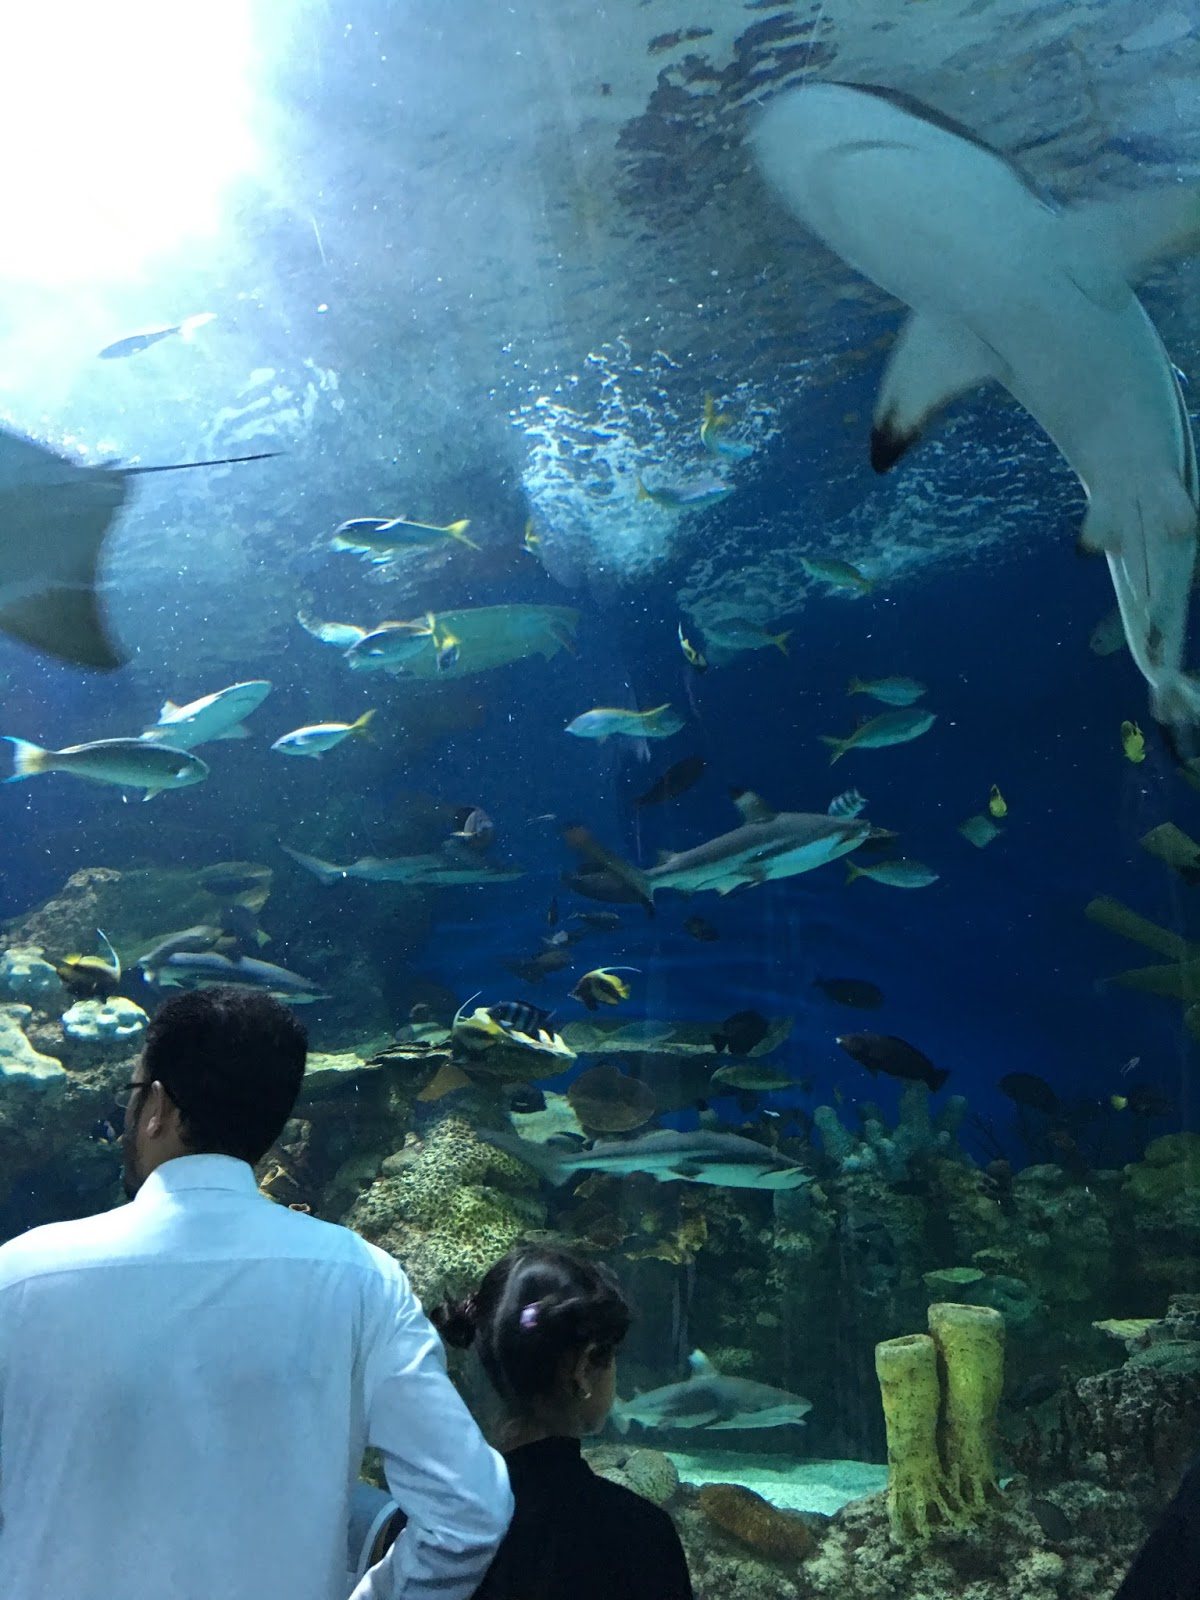 Fish aquarium in jeddah - Fakieh Aquarium Jeddah